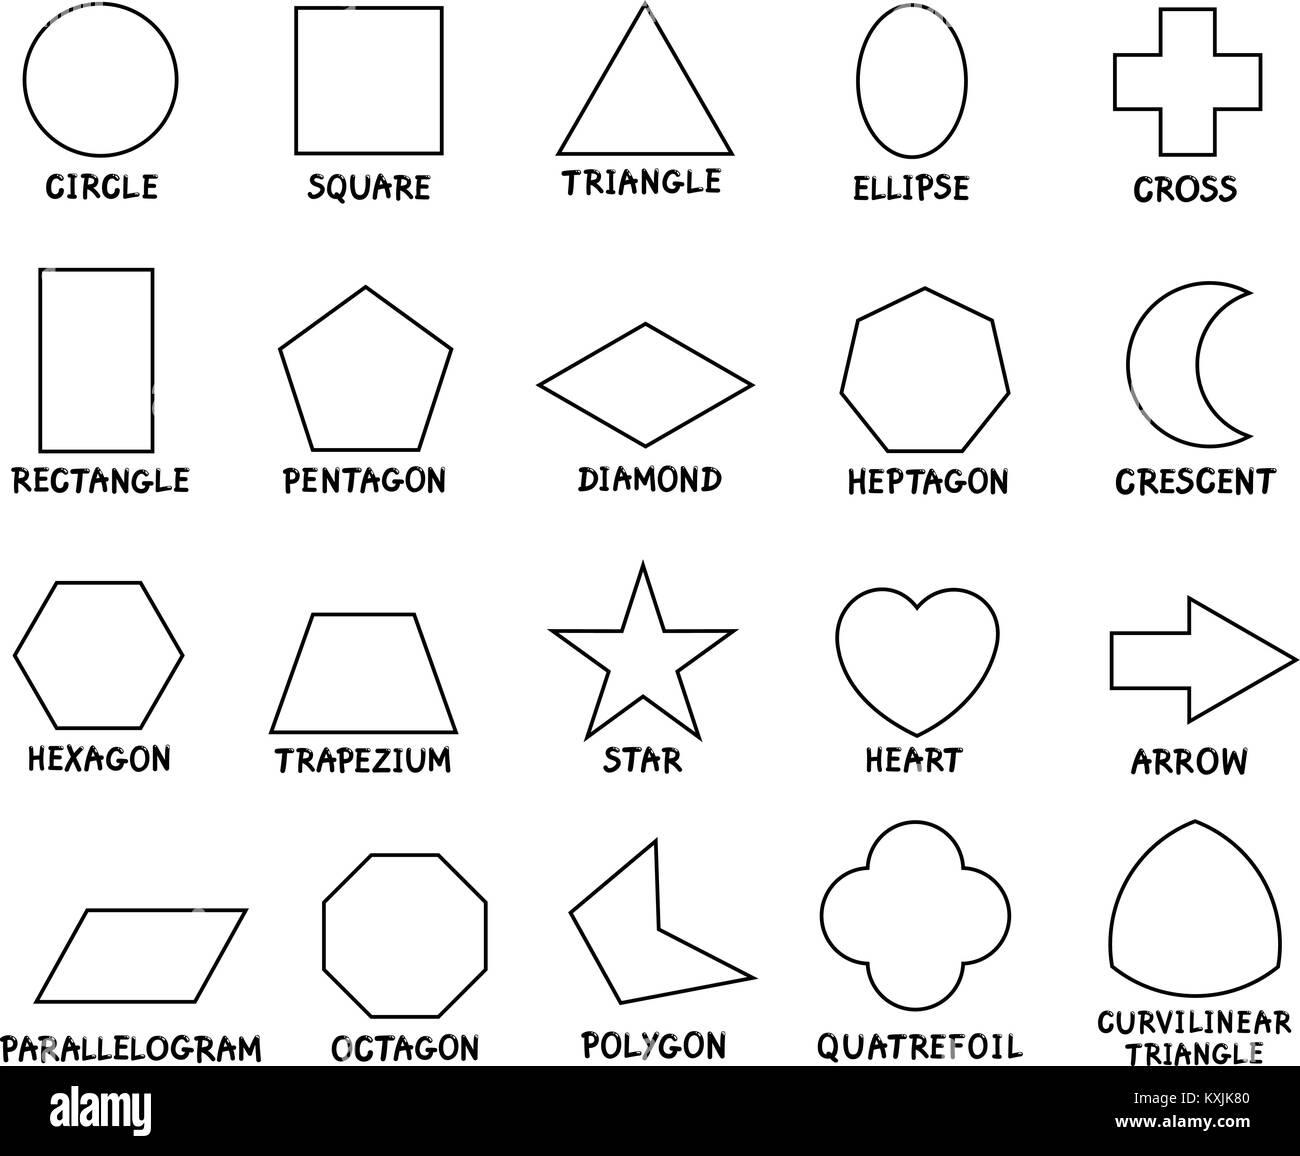 Crescent Shape Worksheet For Preschool